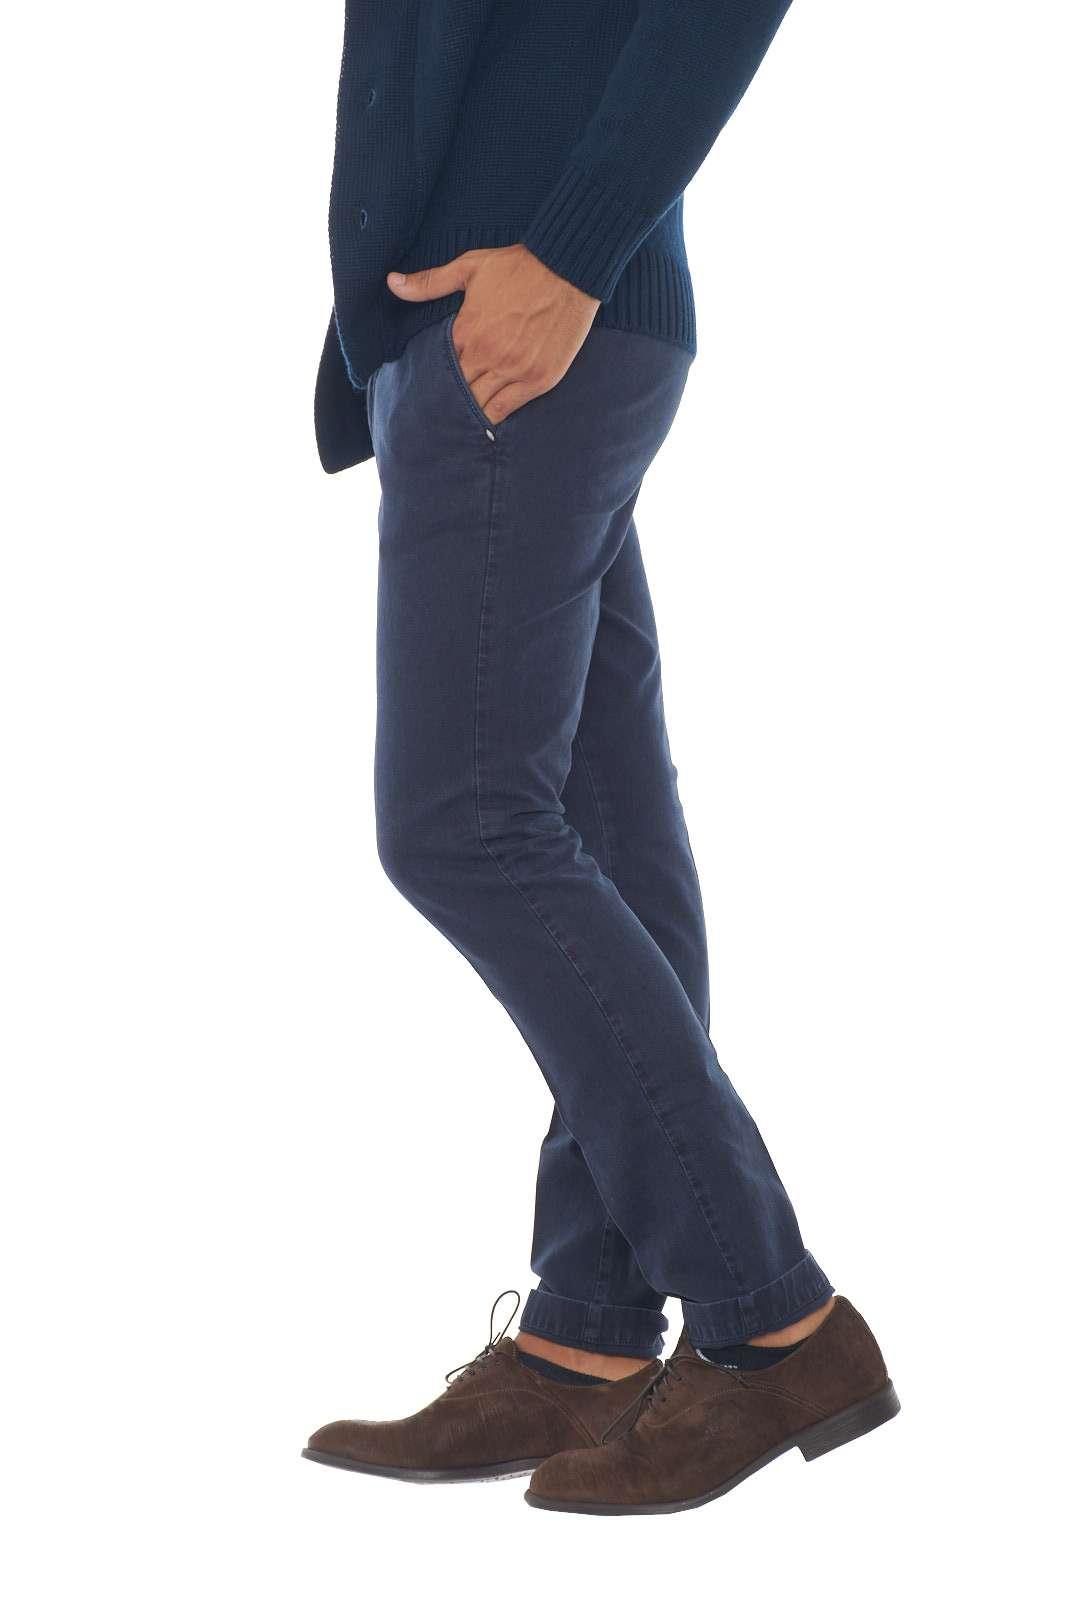 https://www.parmax.com/media/catalog/product/a/i/AI-outlet_parmax-pantaloni-uomo-Michael-Coal-BRAD2443-B.jpg